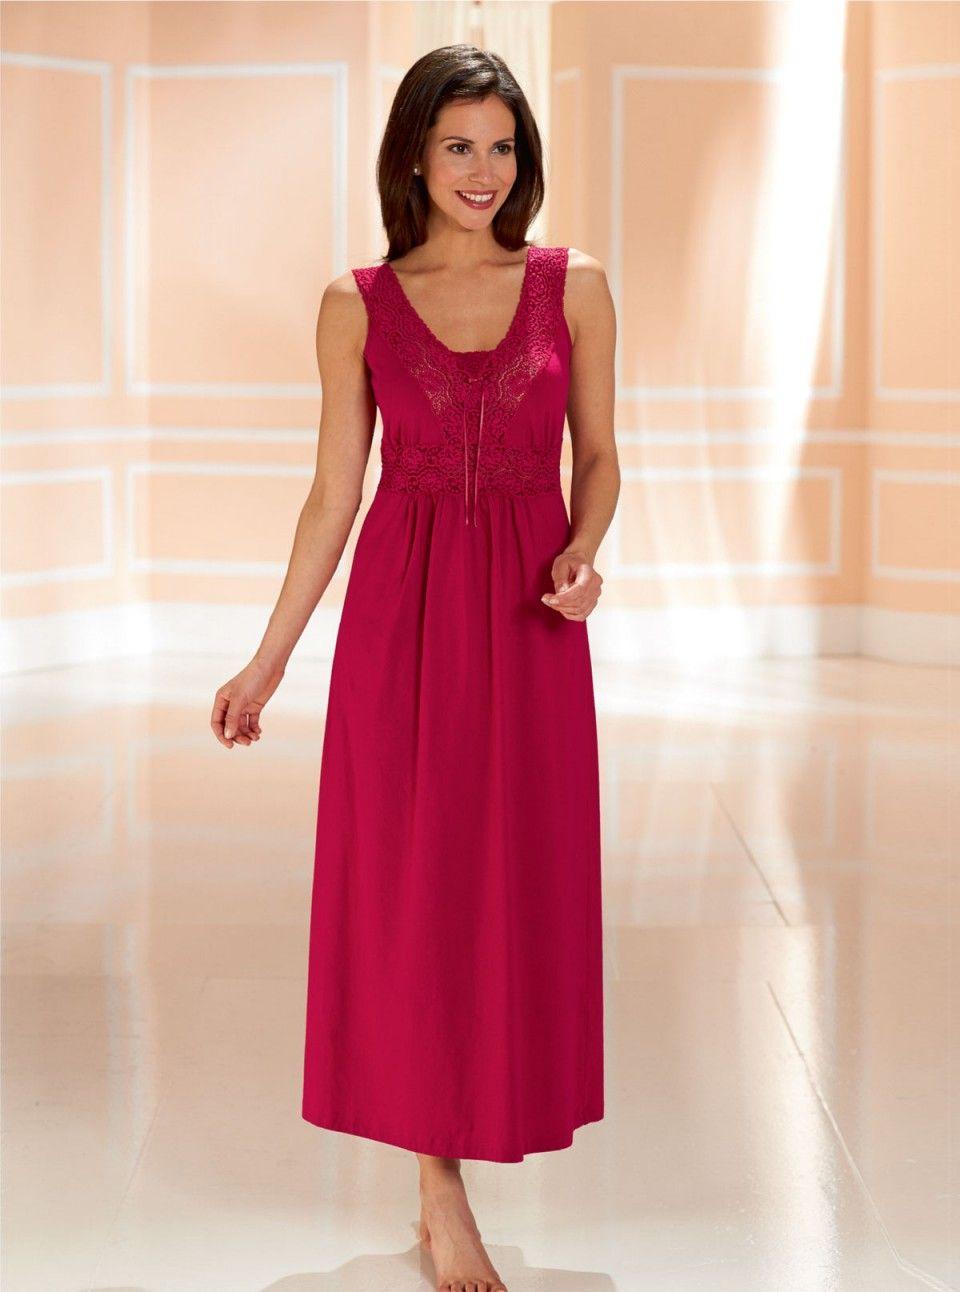 Lacy Jersey Nightdress by David Nieper davidnieper.co.uk Night Shirts For  Women 96b1c031b